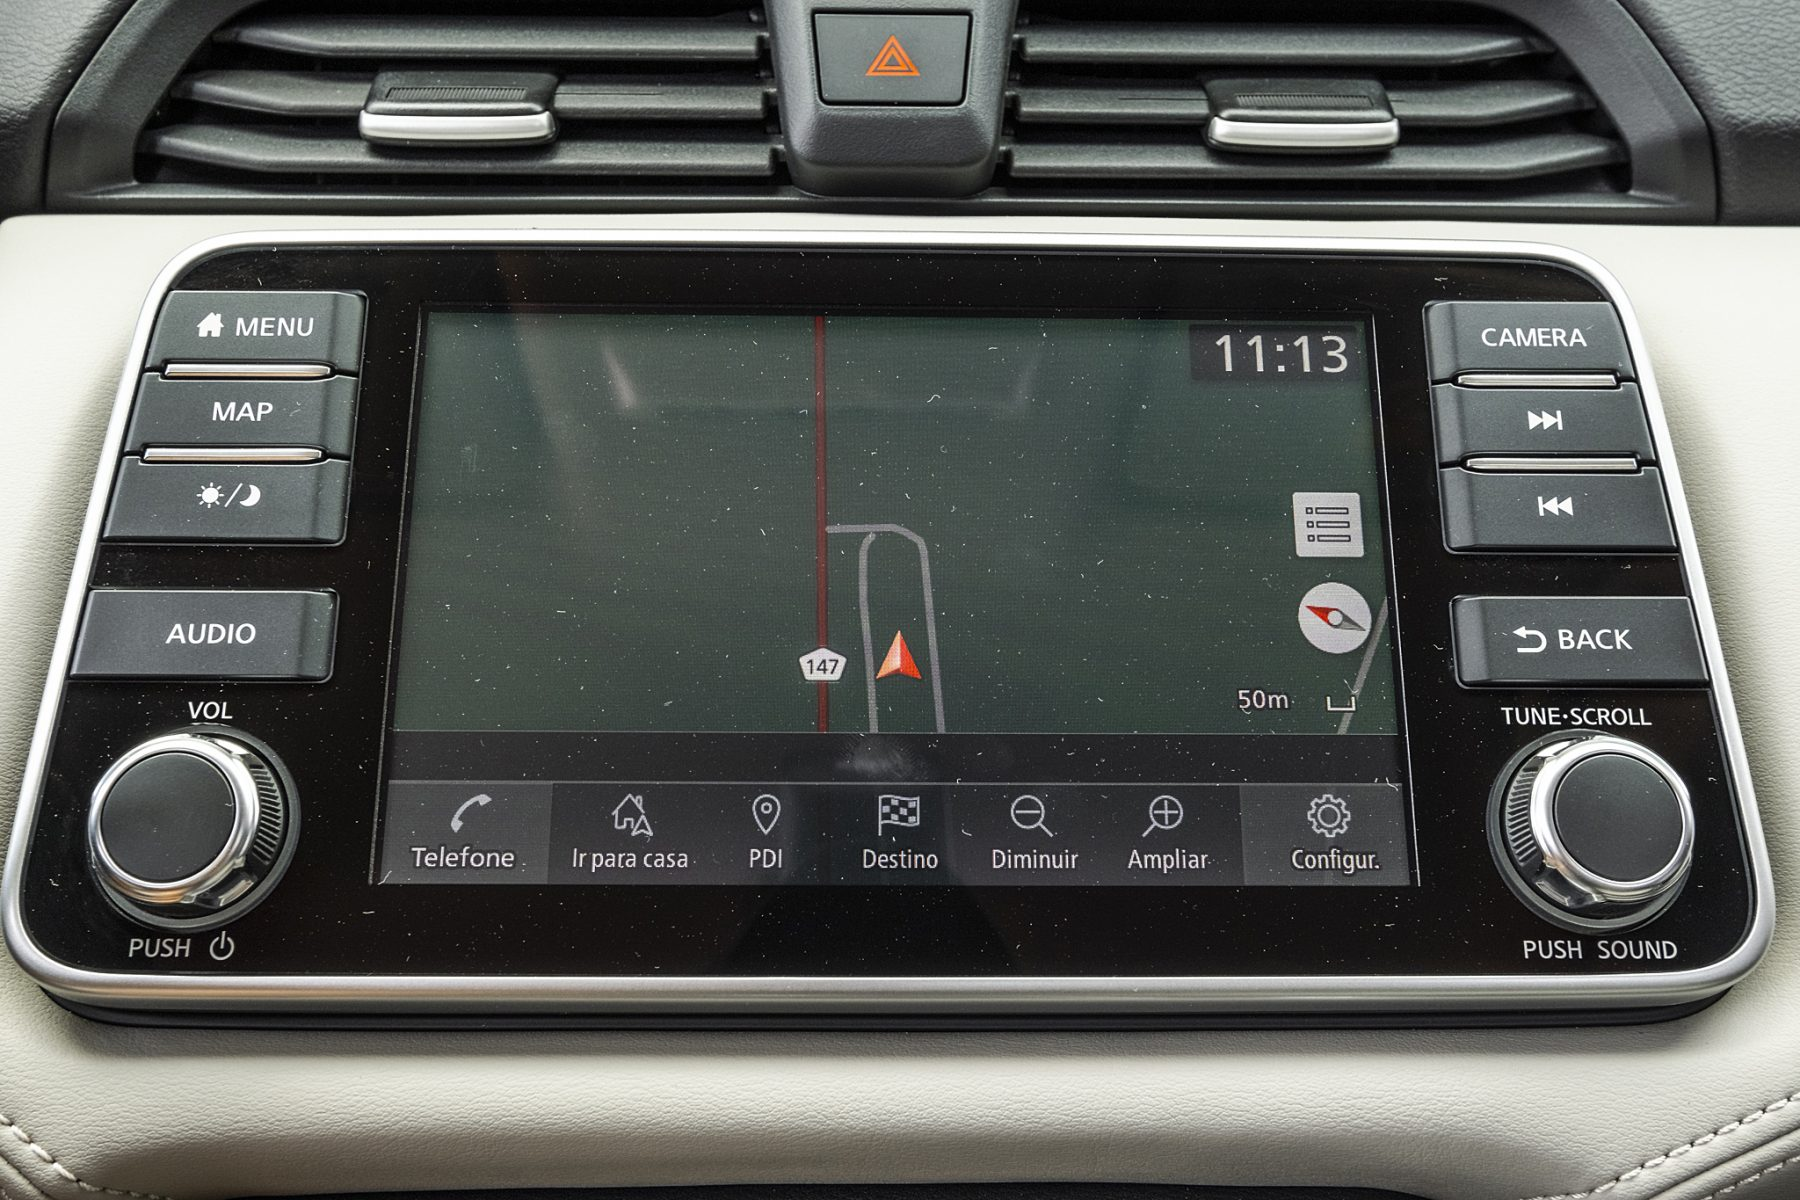 Novo-Nissan-Versa-2021-739--e1605735946209.jpg